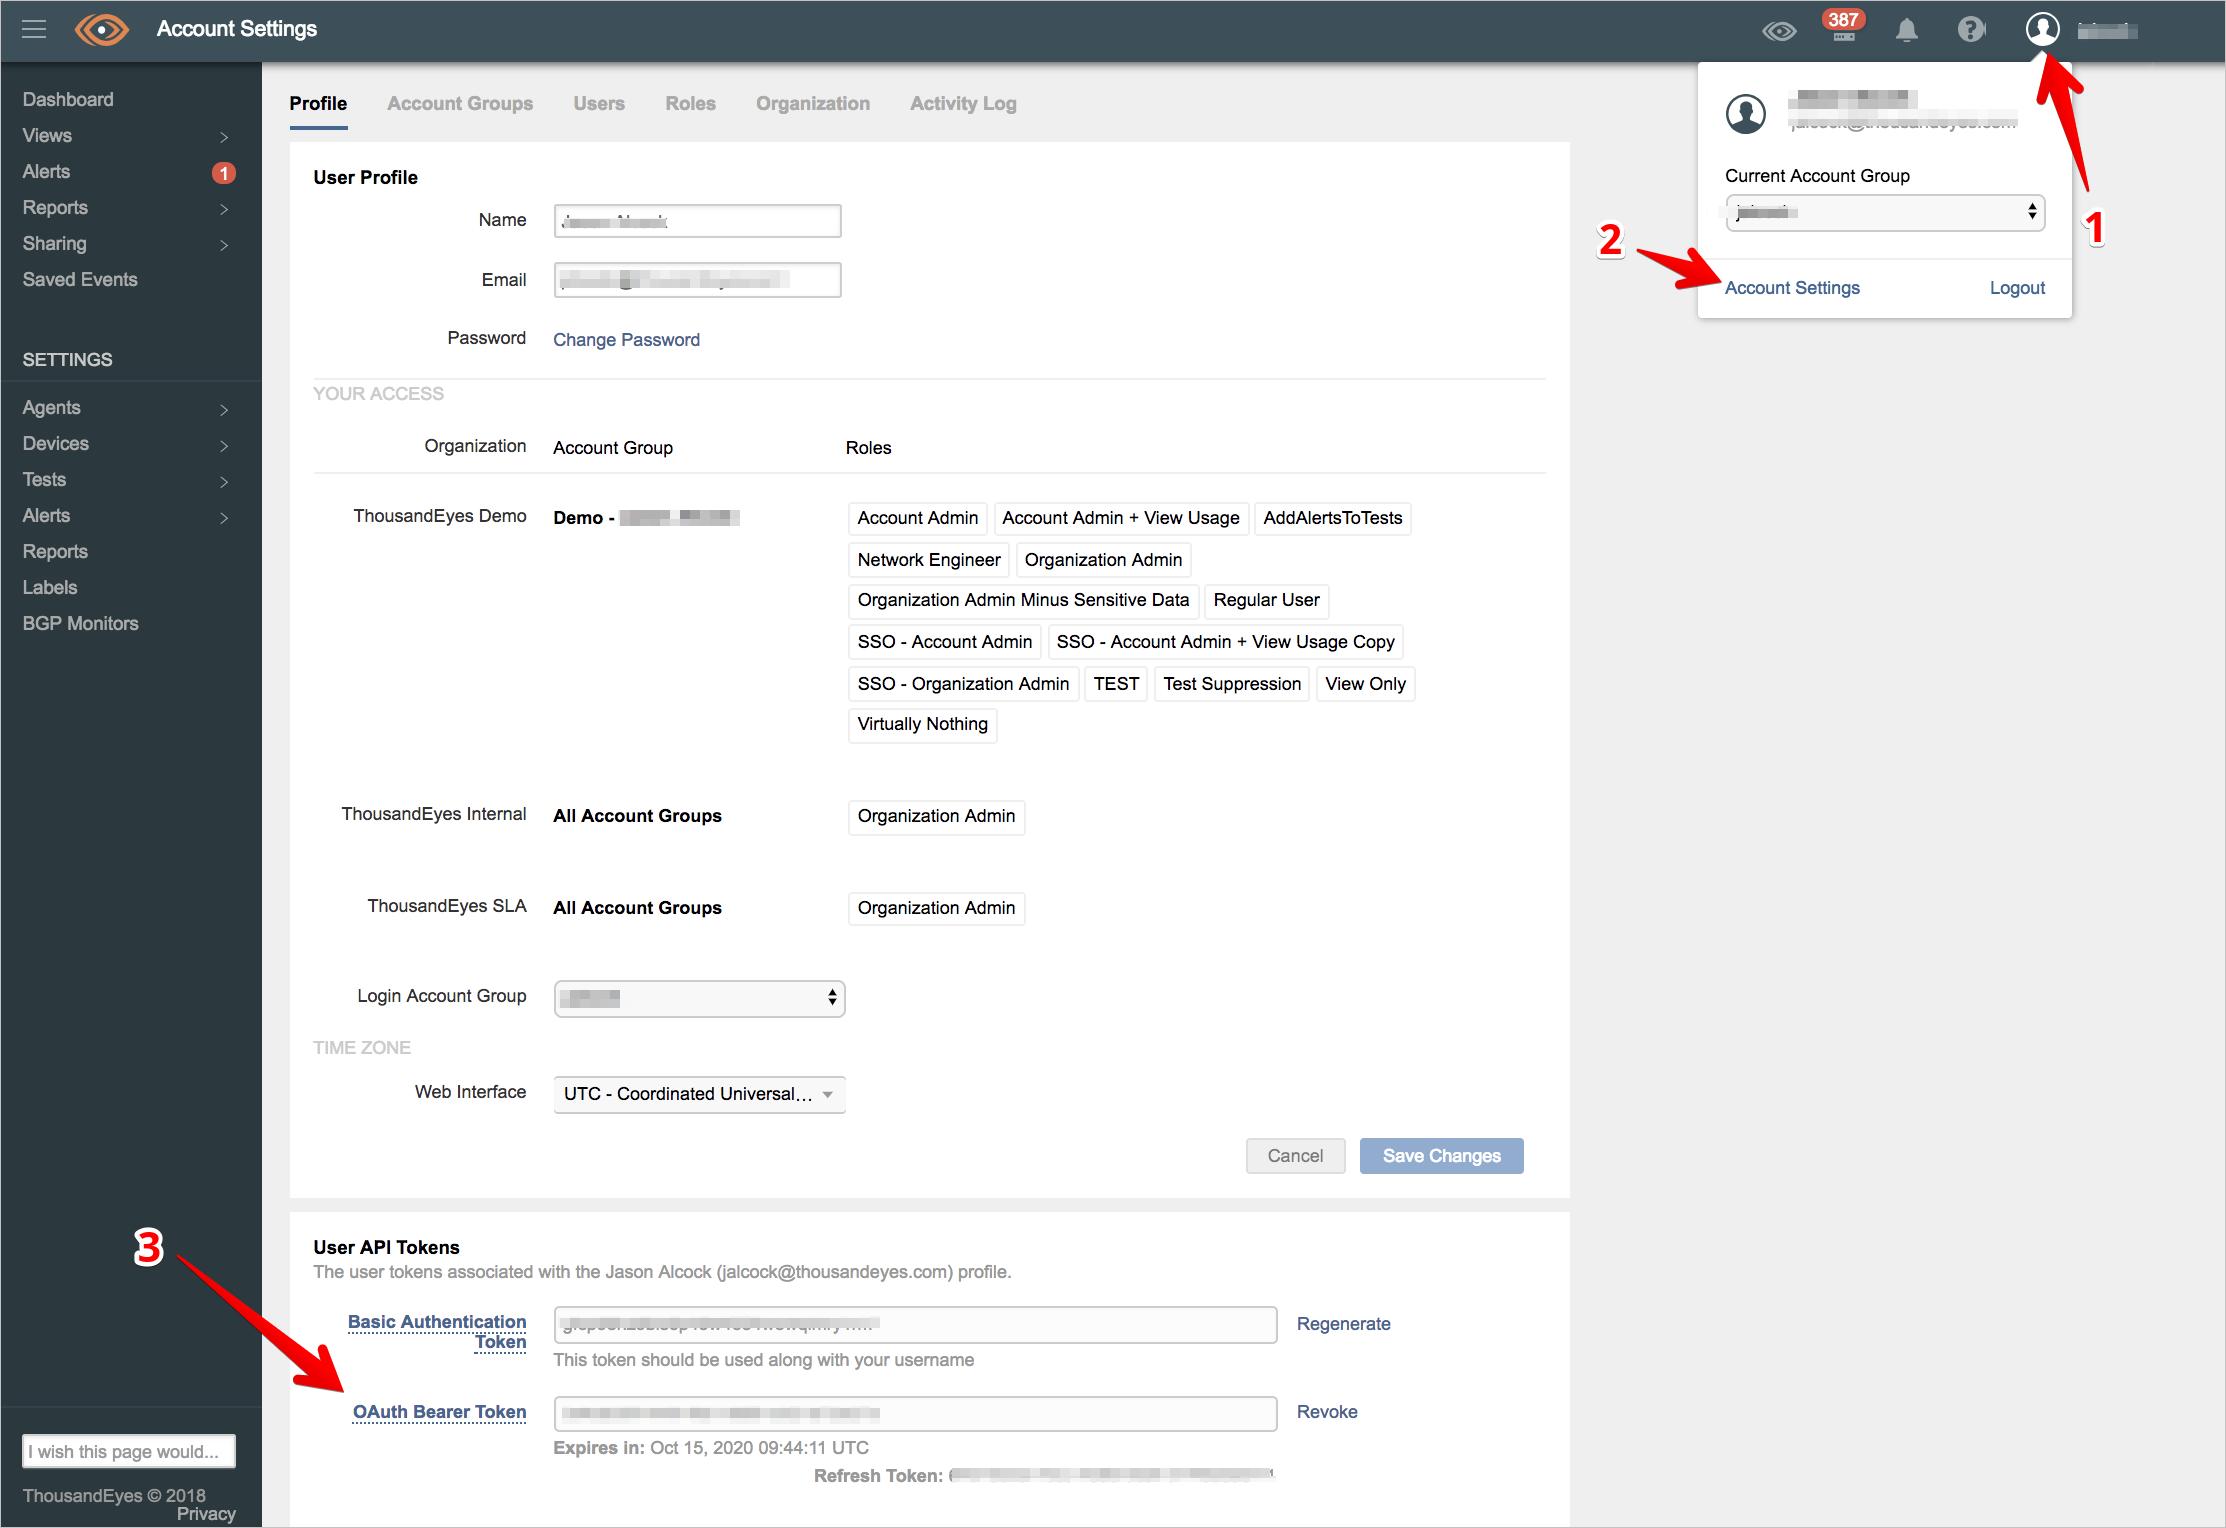 User Permissions Condeco Enterprise Admin User Manual 3 4